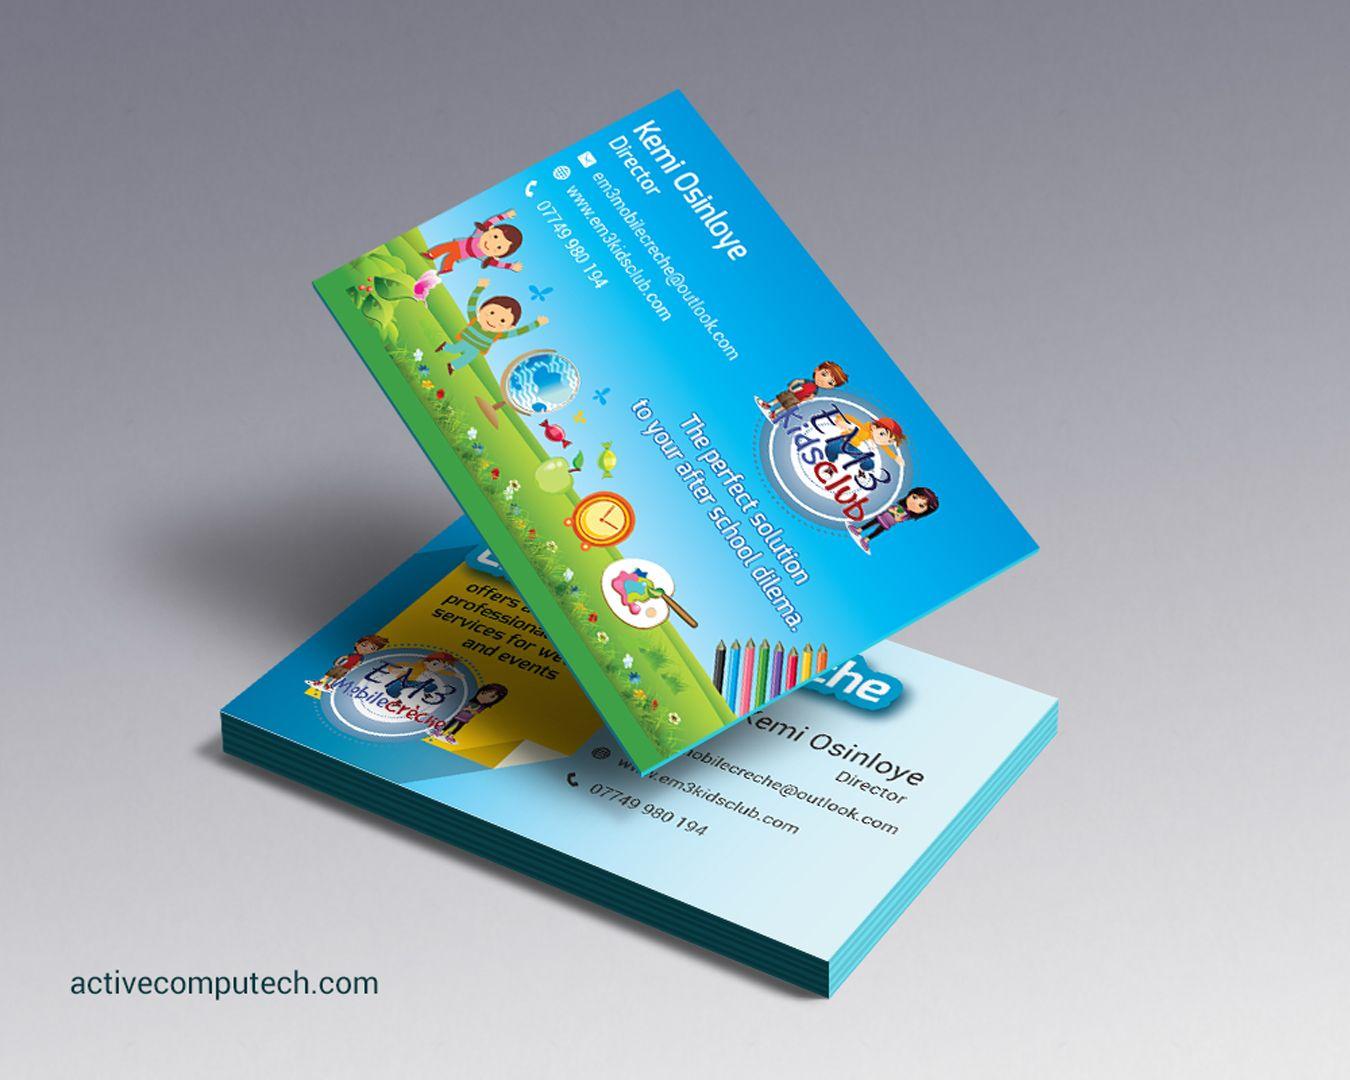 School kids fun business card designs httpactivecomputech school kids fun business card designs httpactivecomputech colourmoves